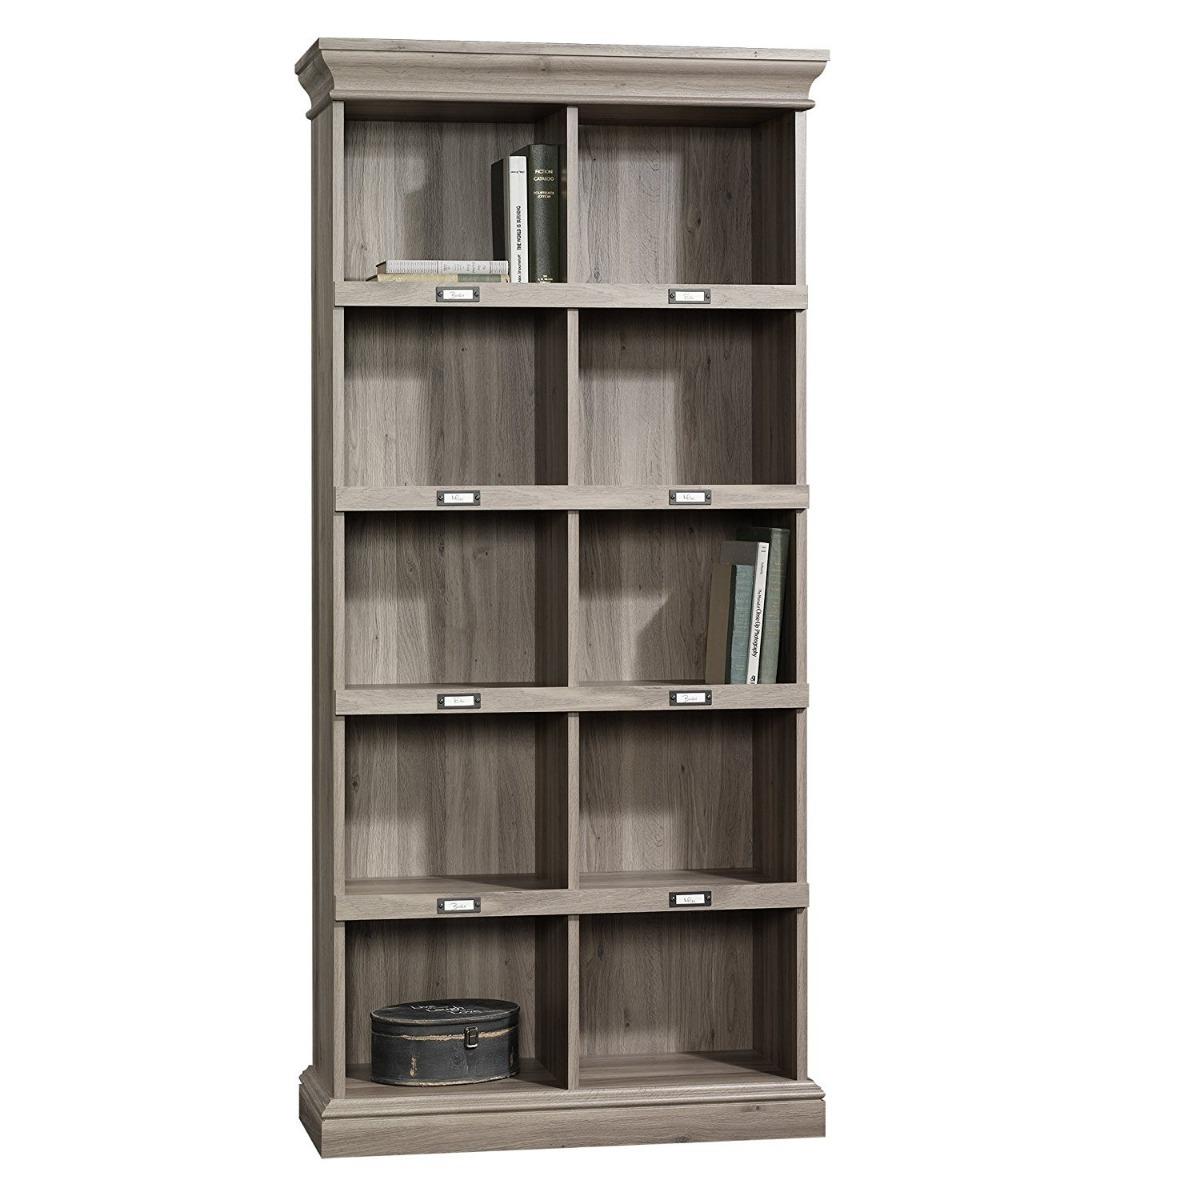 Librero de madera moderno alto sauder salt oak 8 300 - Libreros de madera modernos ...